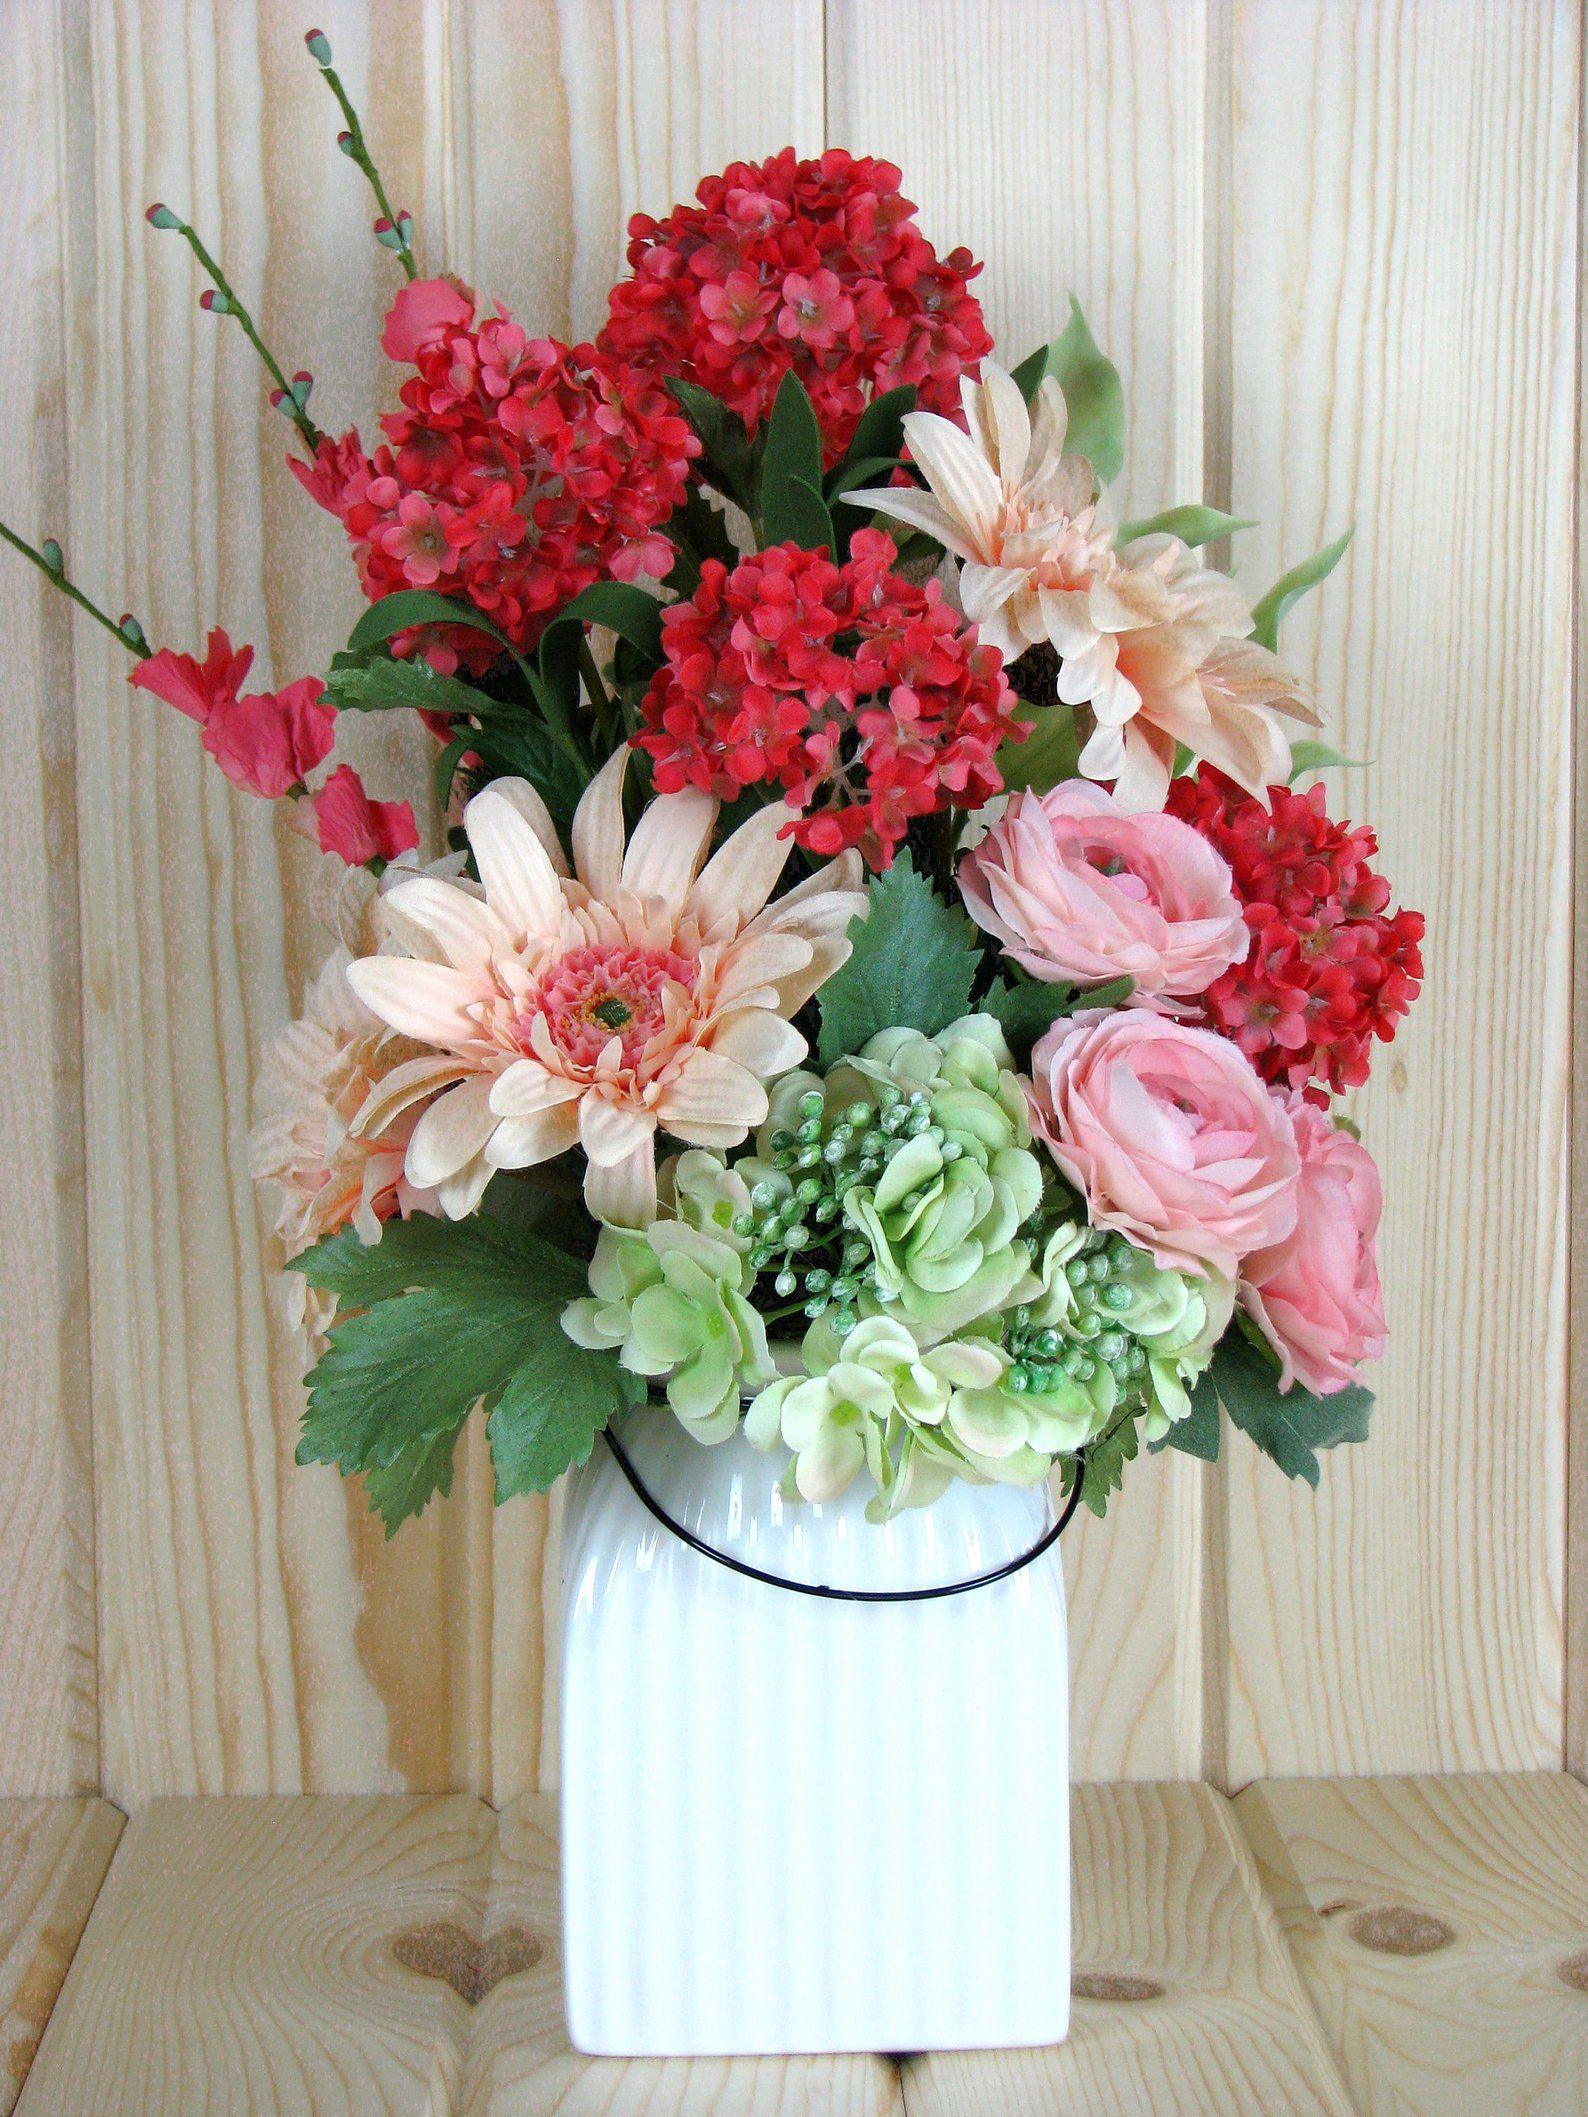 Flower arrangement gift get well gift for her permanent